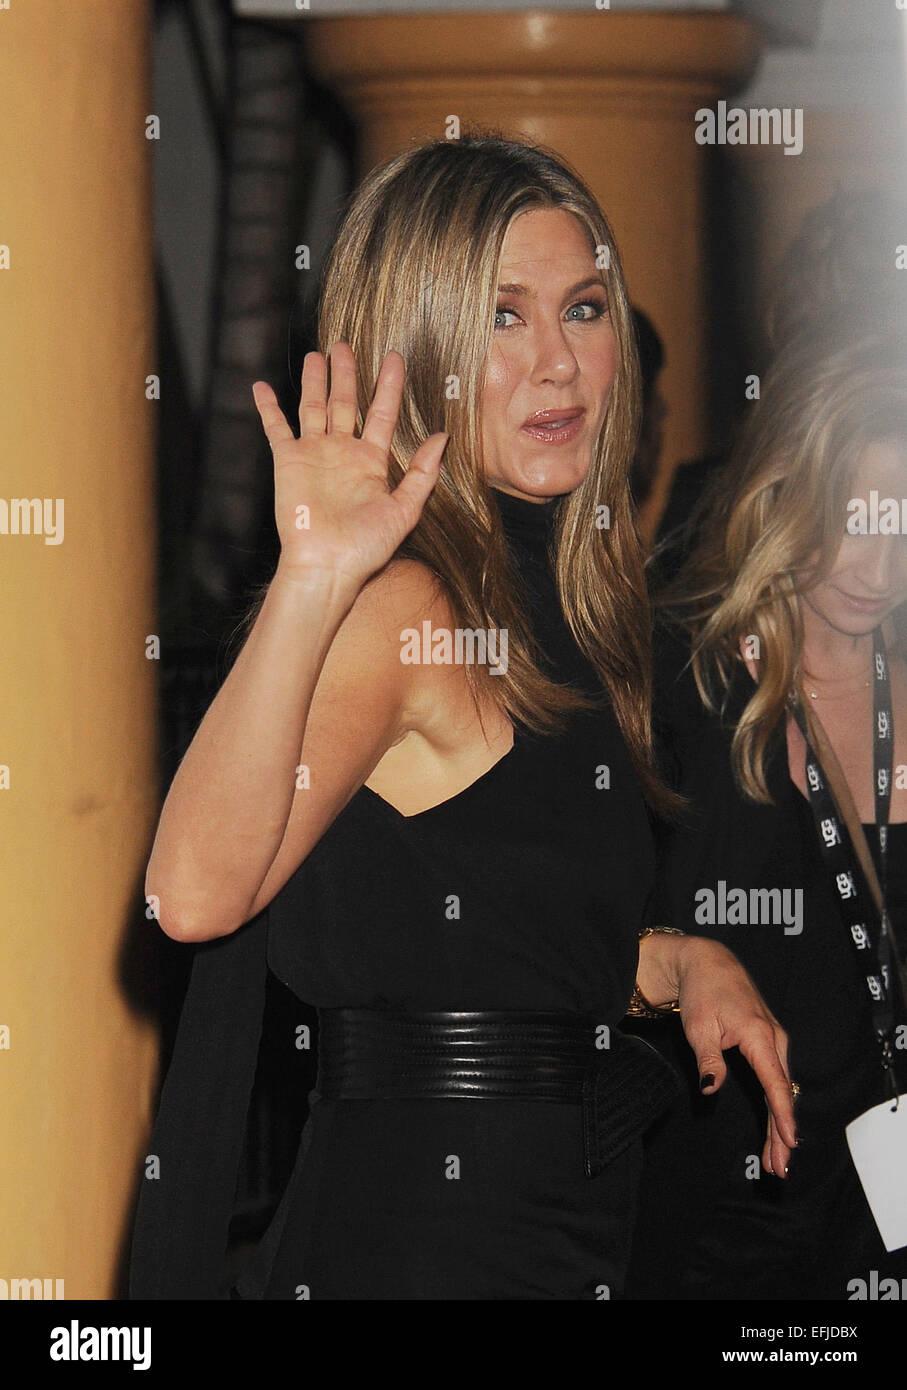 JENNIFER ANISTON  US film actress in January 2015. Photo Jeffrey Mayer - Stock Image